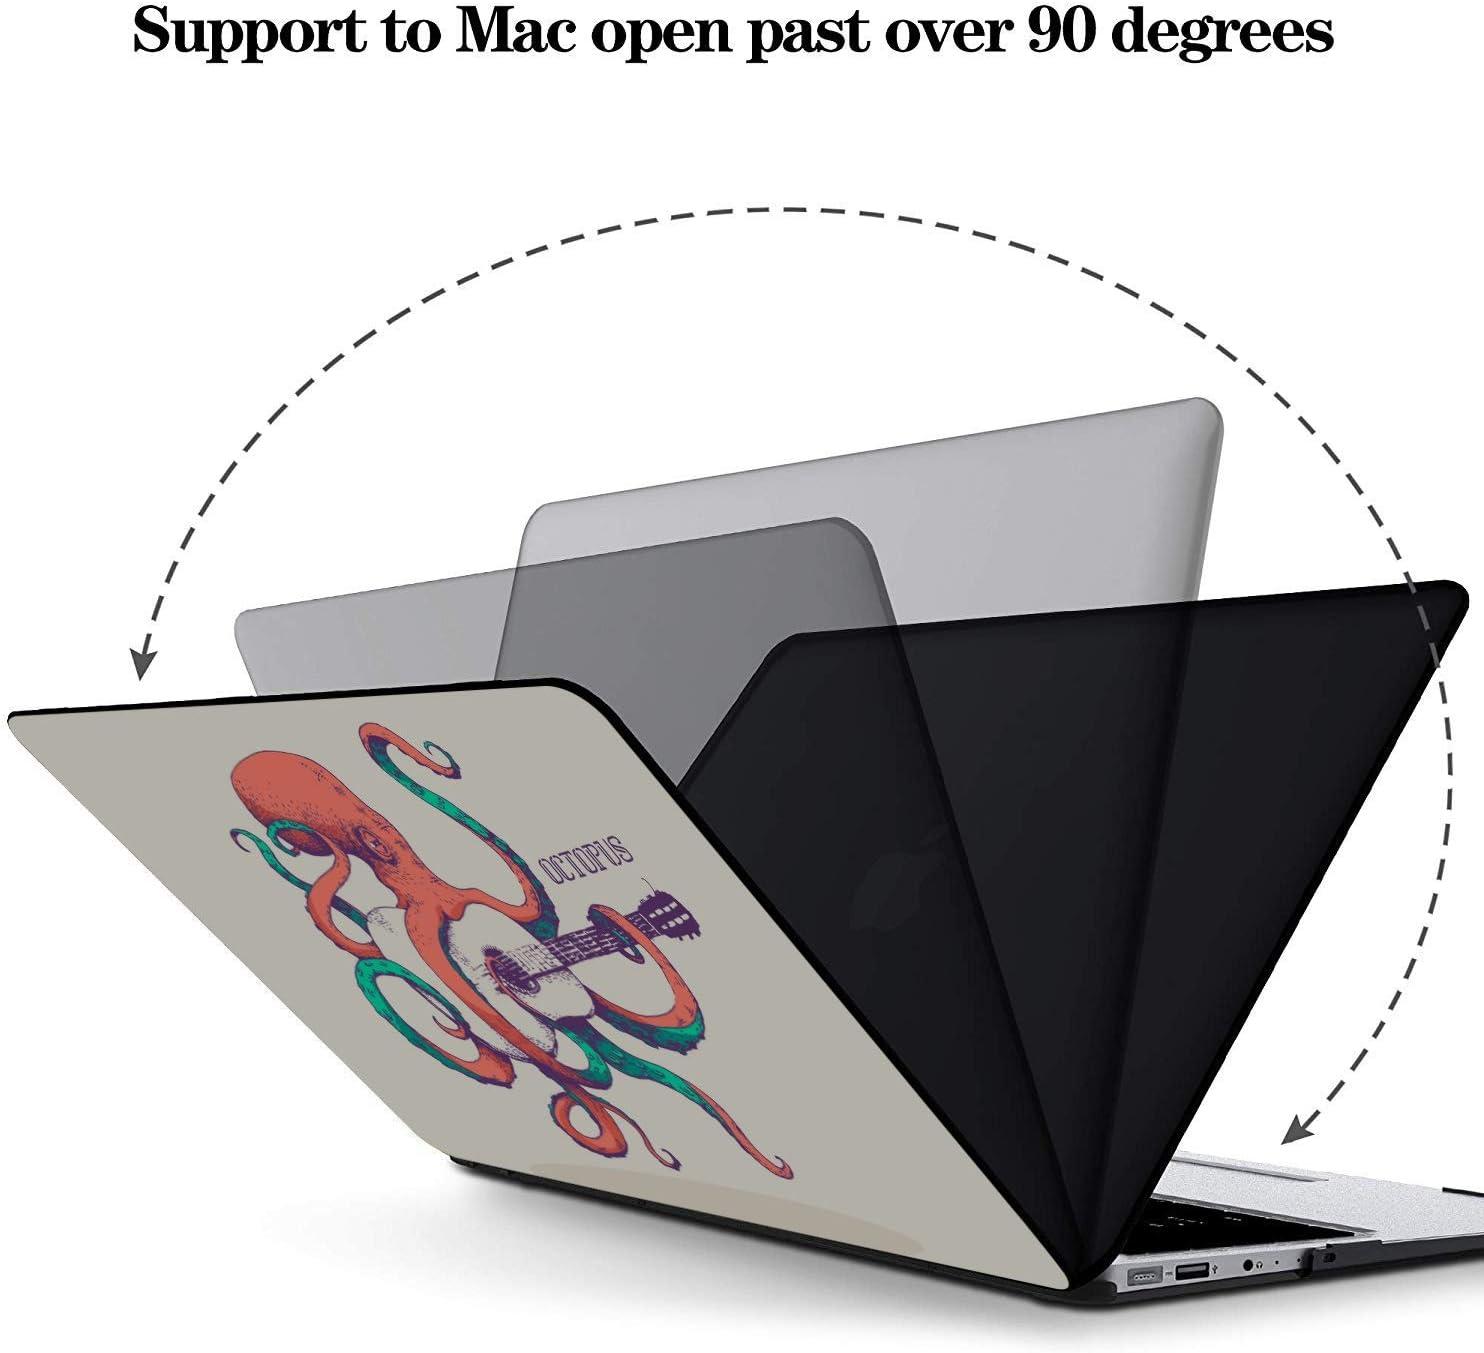 13inch MacBook Pro Case Cartoon Sea Ocean Octopus Character Plastic Hard Shell Compatible Mac Air 11 Pro 13 15 MacBook Pro A1989 Case Protection for MacBook 2016-2019 Version